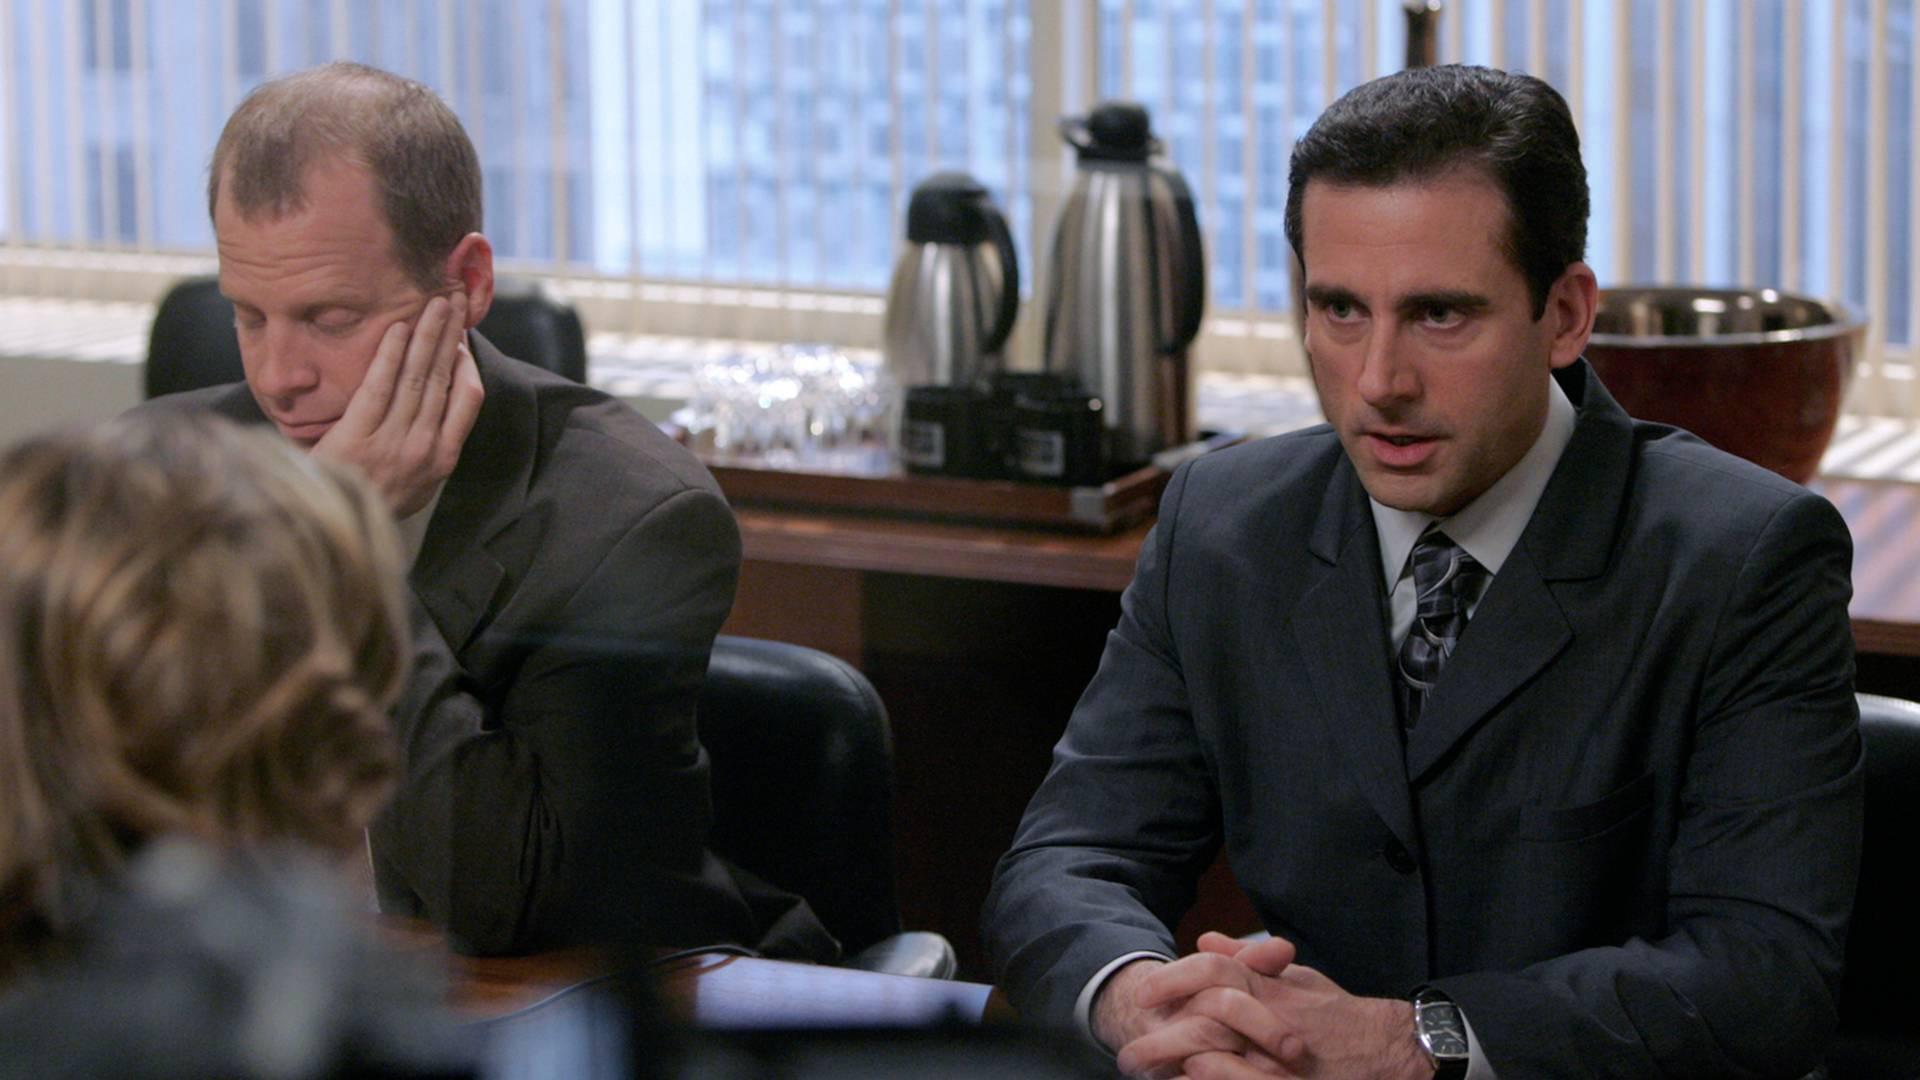 The Office Season 3 Episode 19